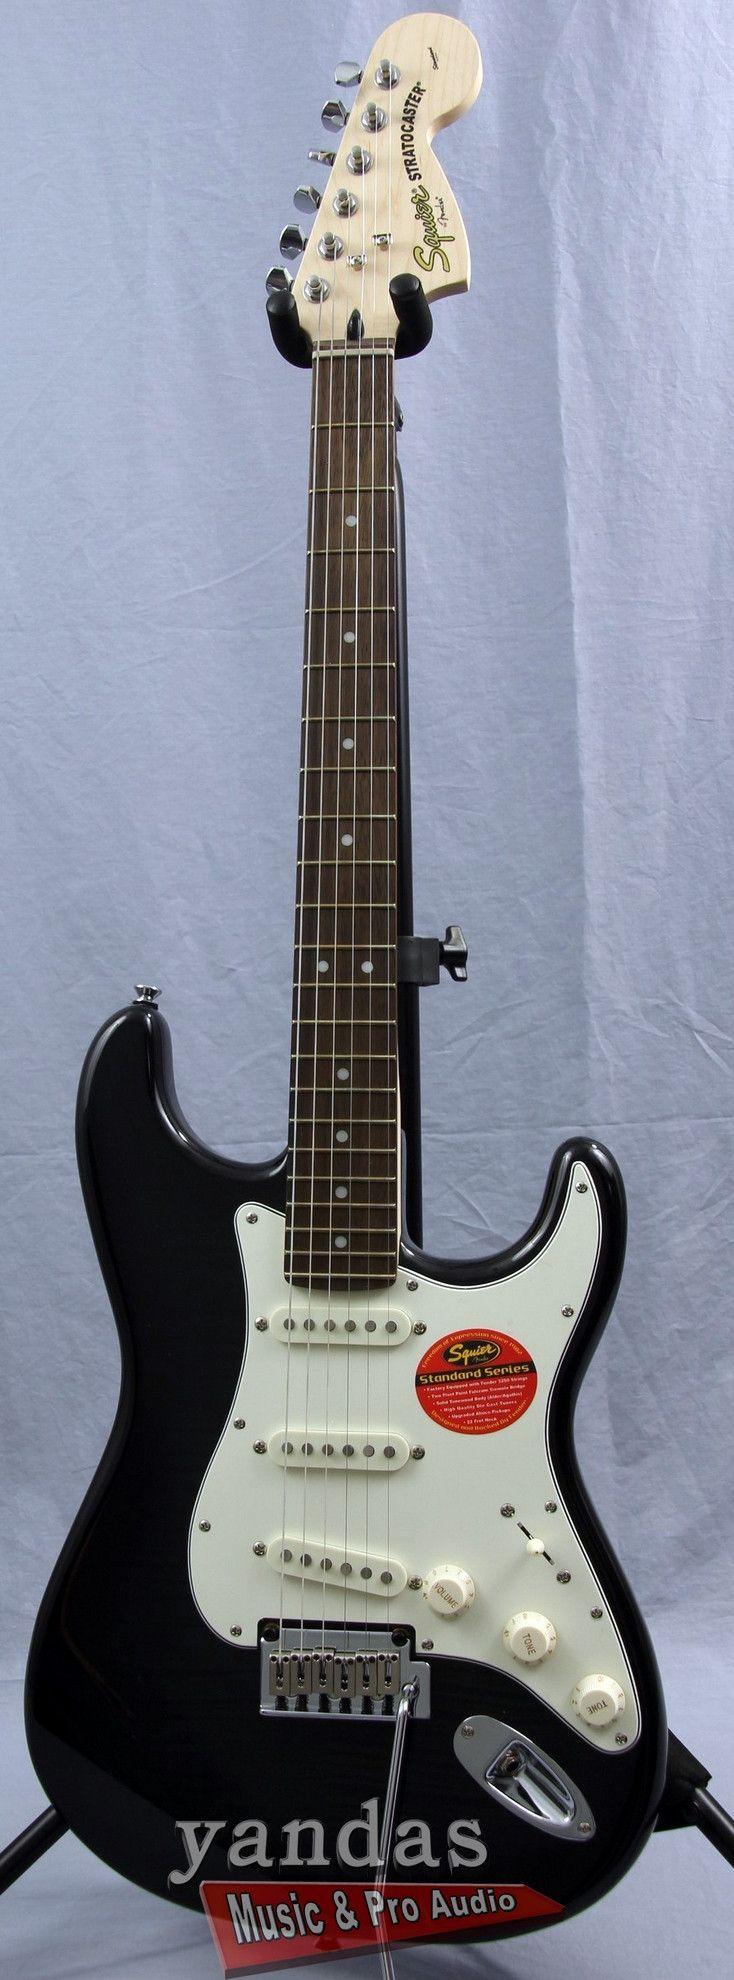 Squier Standard Stratocaster FMT Electric Guitar